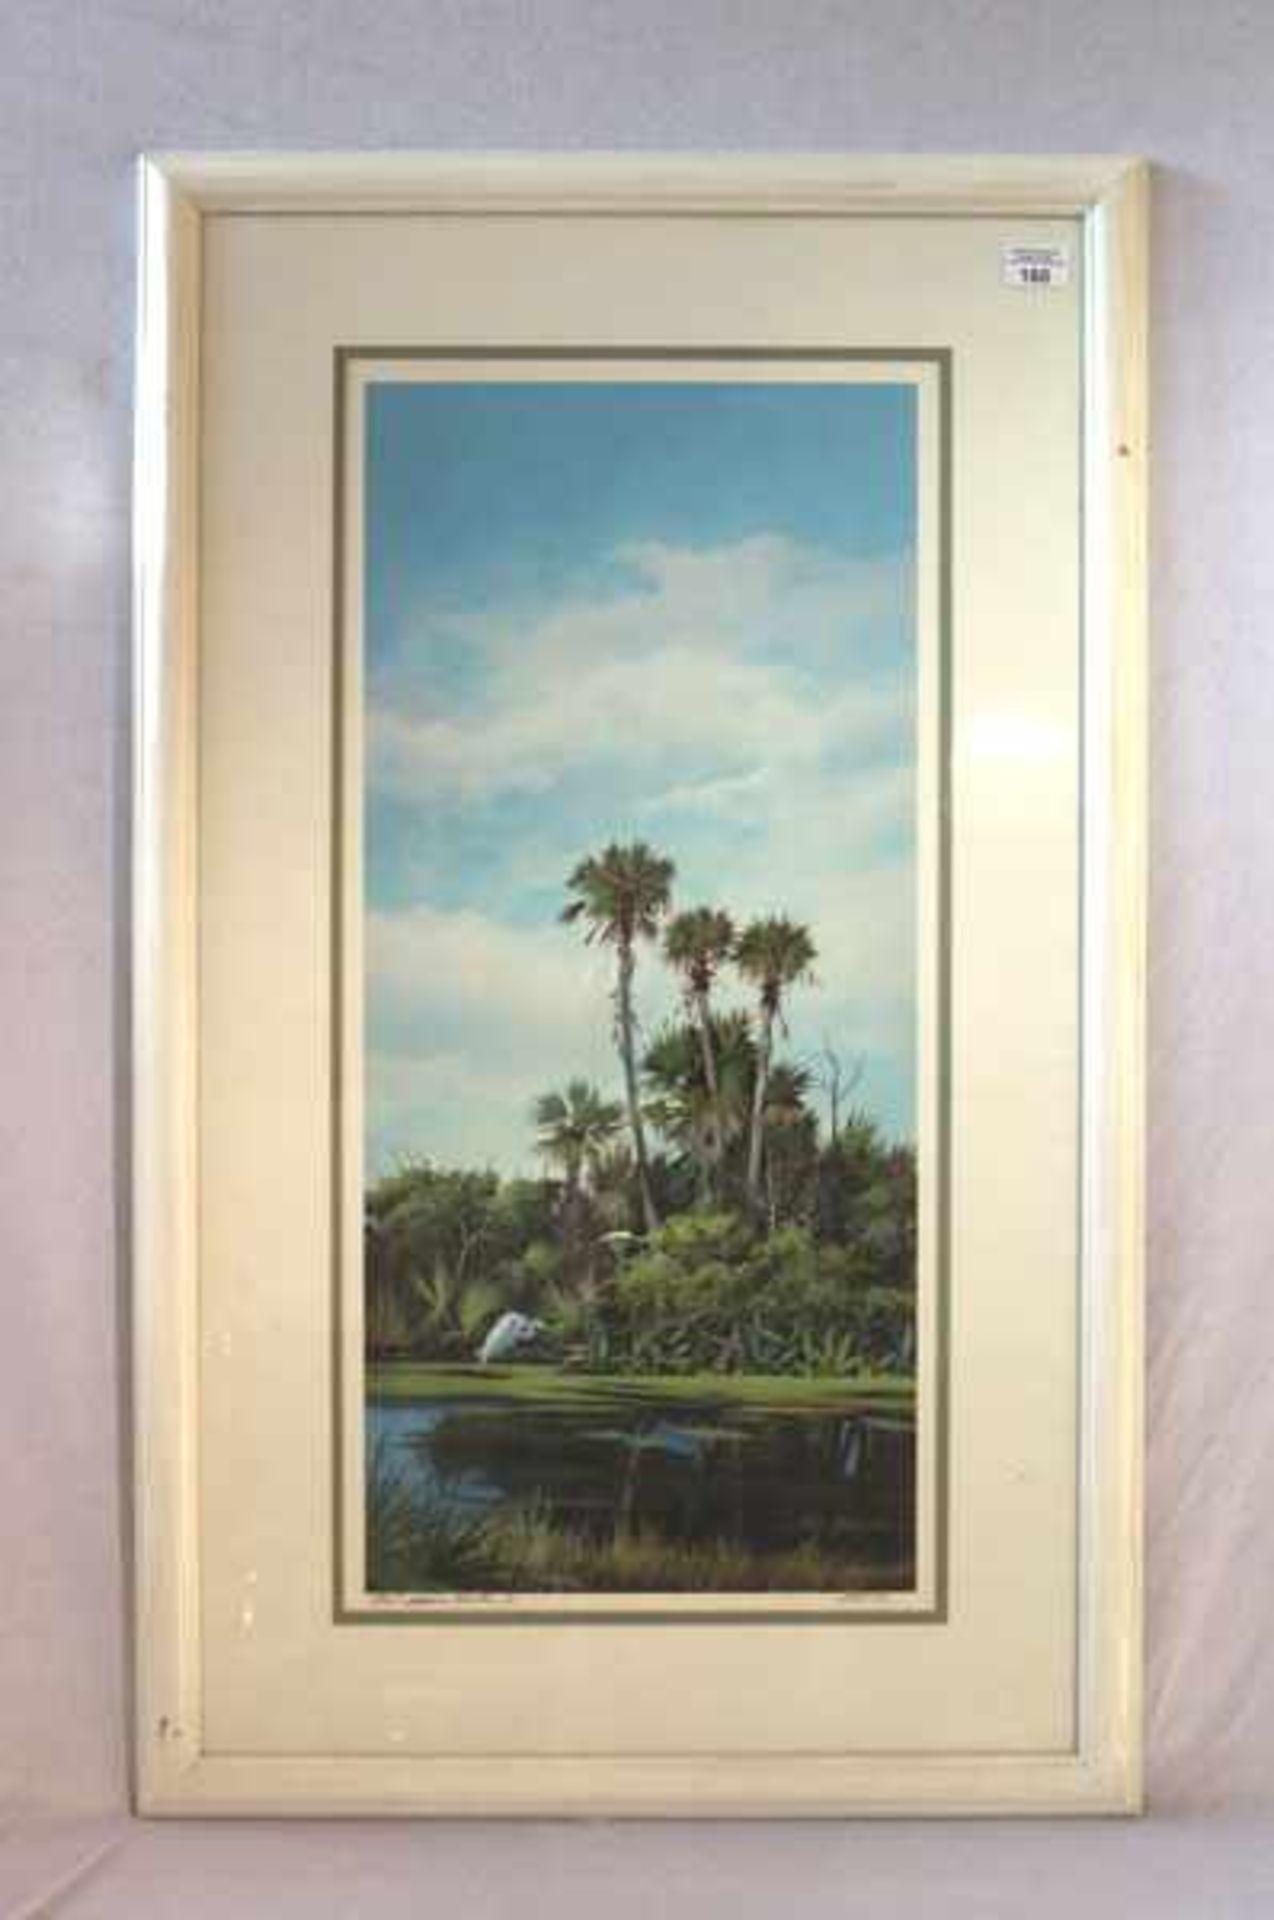 Los 160 - Druck 'Palmeninsel' mit Passepartout unter Glas gerahmt, Rahmen bestossen, incl. Rahmen 99 cm x 59